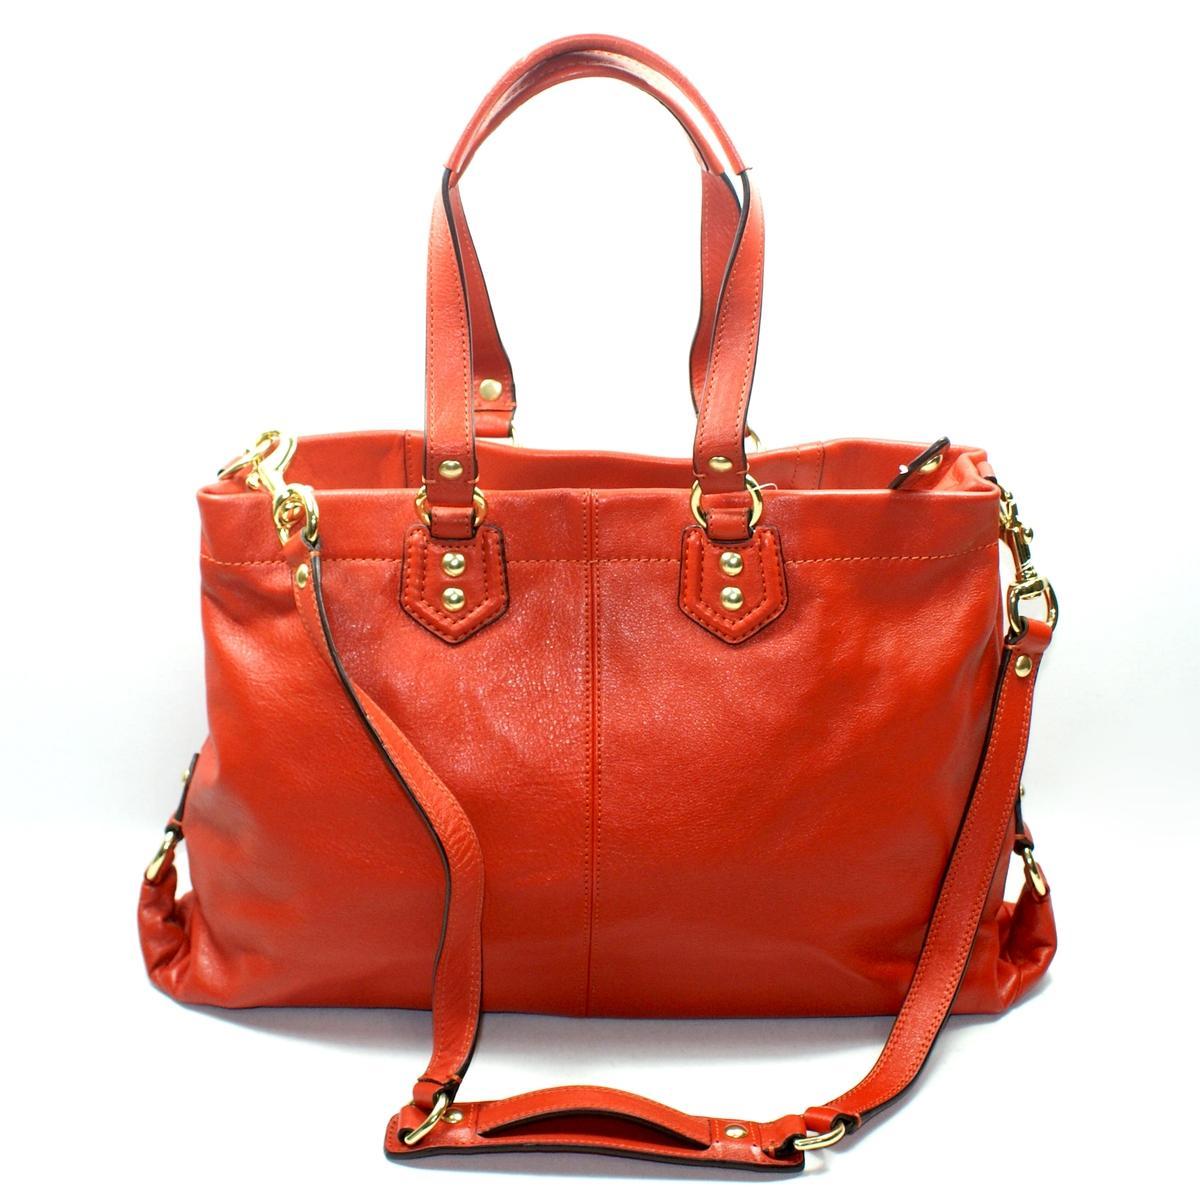 Coach Ashley Leather Carryall Handbag\/ Shoulder Bag #19243  Coach 19243